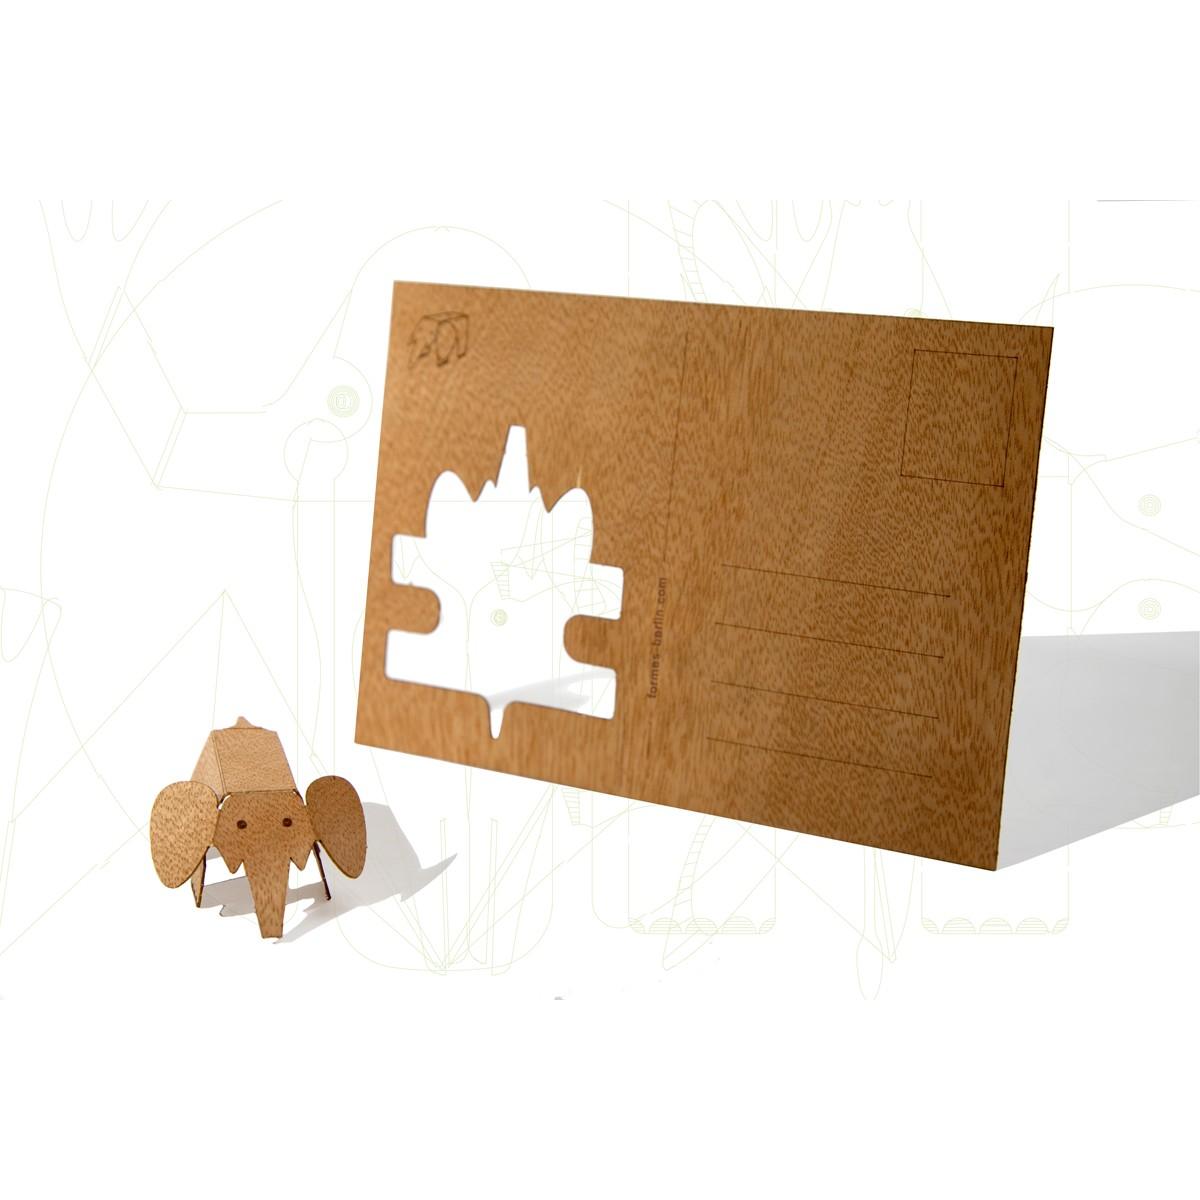 Postkarten aus Holz - 6 Elefantenkarten